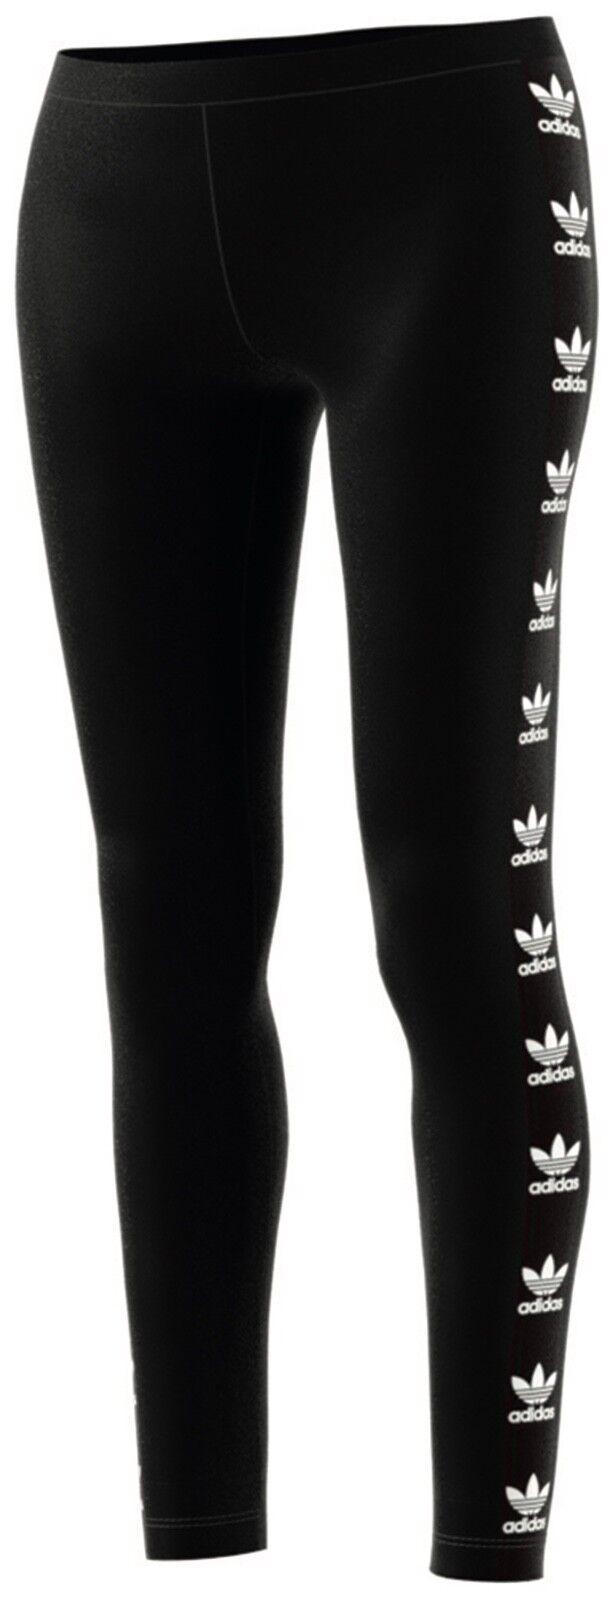 Adidas Leggings Damen damen Stretch Hose Turnhose Sporthose Sporthose Sporthose Leggins 140a77